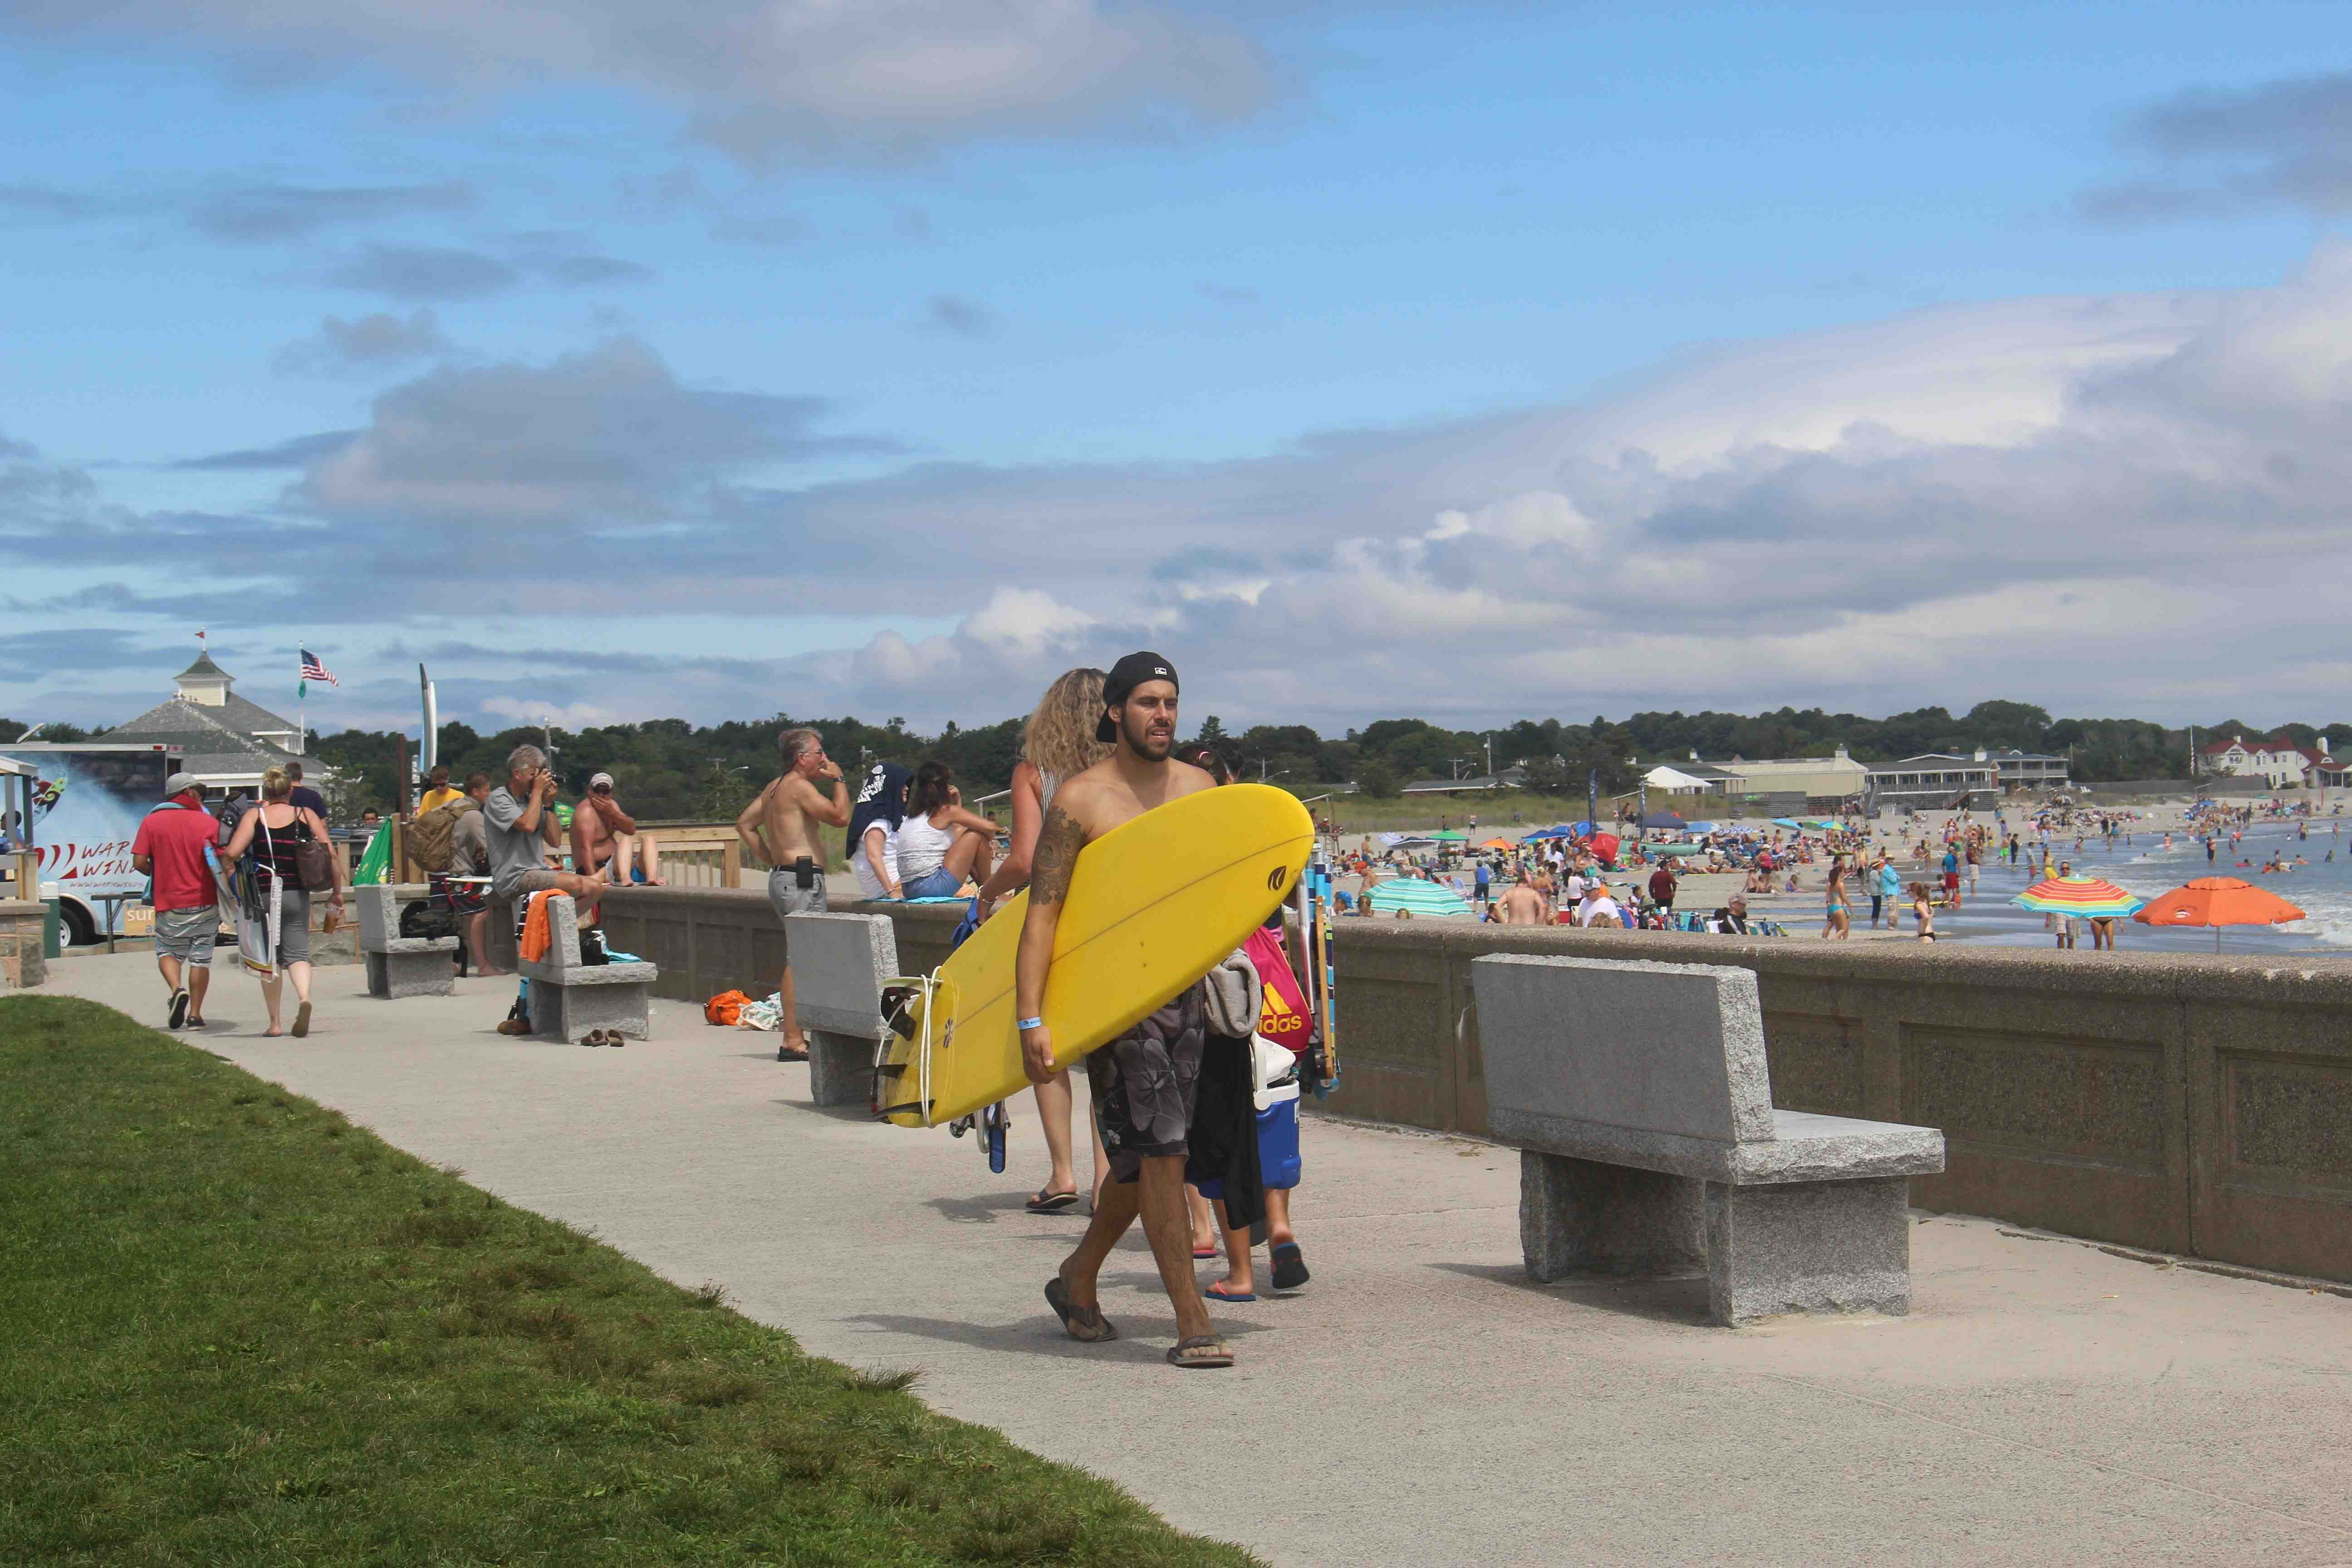 The 25 best beach towns in new england from yankee magazine narragansett rhode island geenschuldenfo Image collections